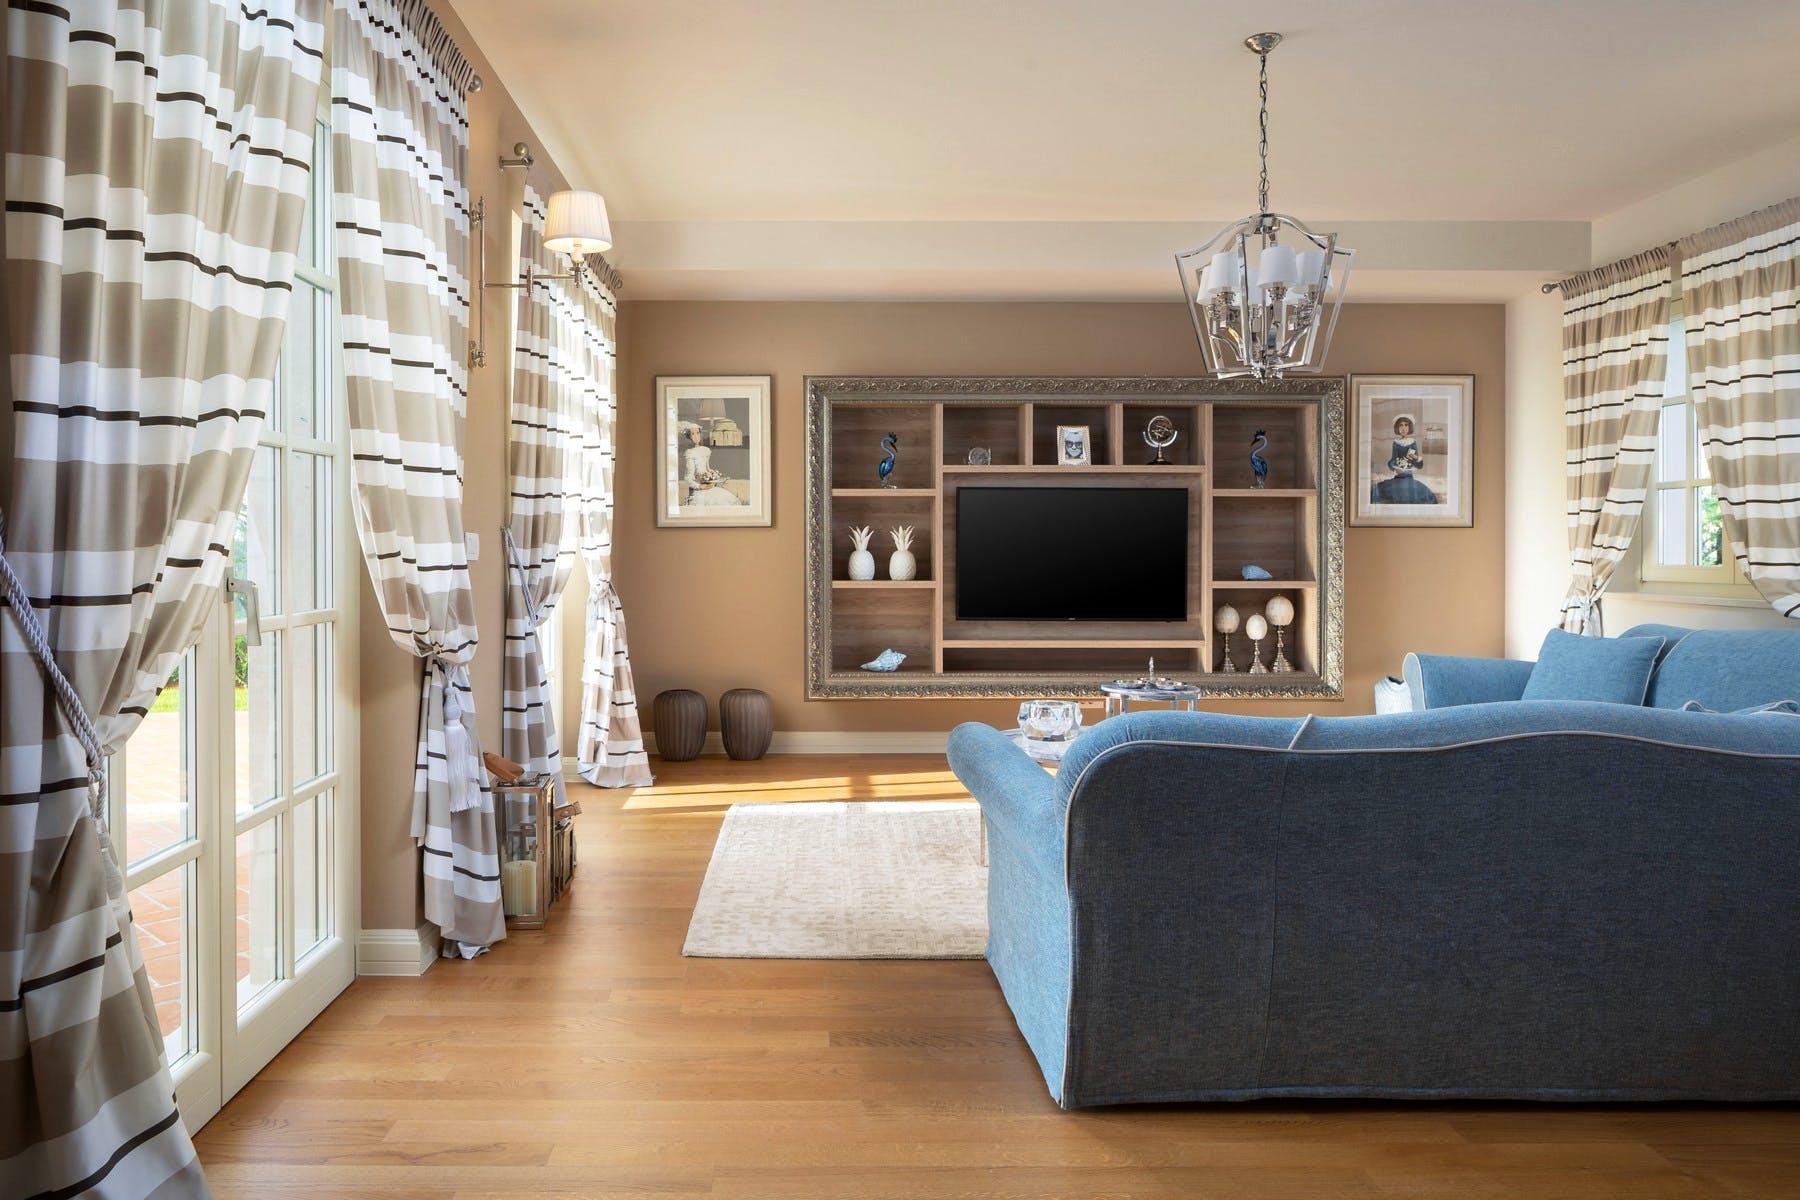 Harmonious living room decor